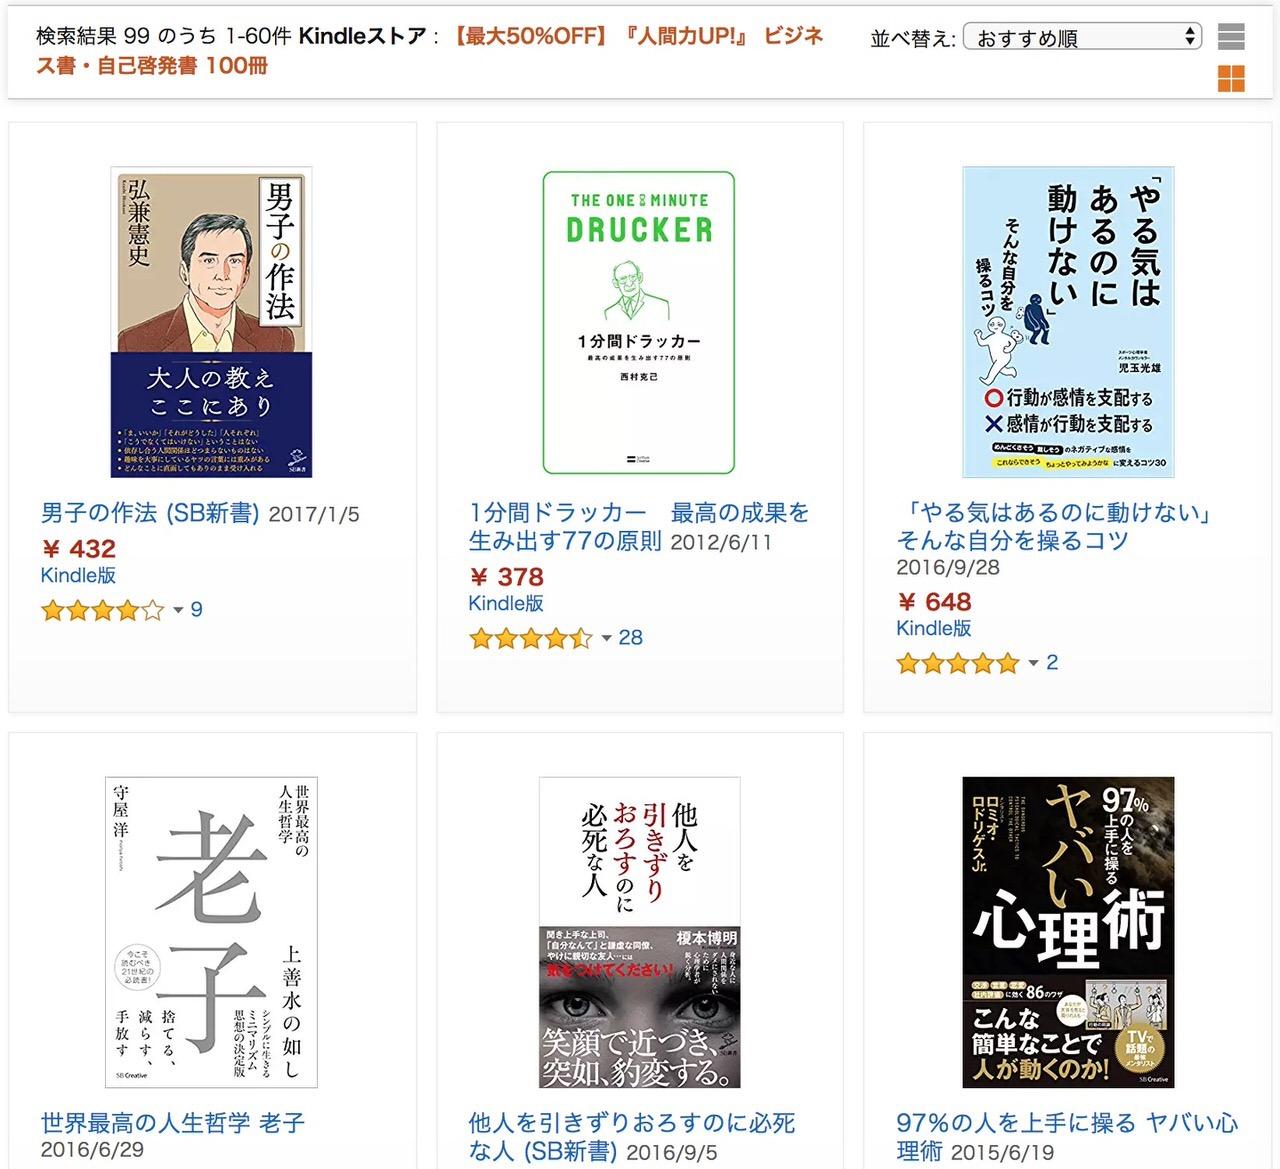 【Kindleセール】最大50%OFF「人間力UP!」ビジネス書・自己啓発書 100冊